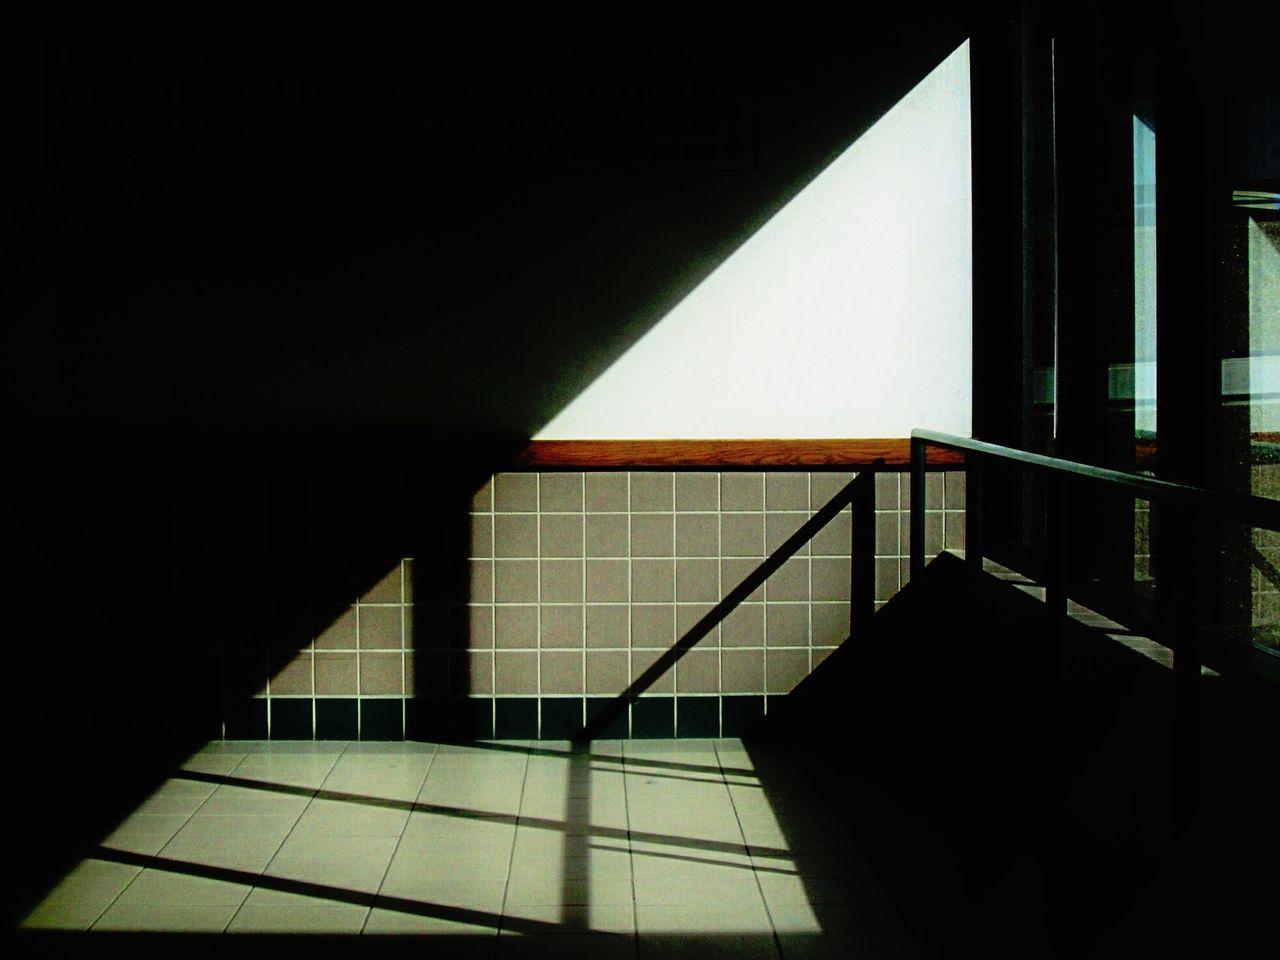 Shadow of railing in balcony